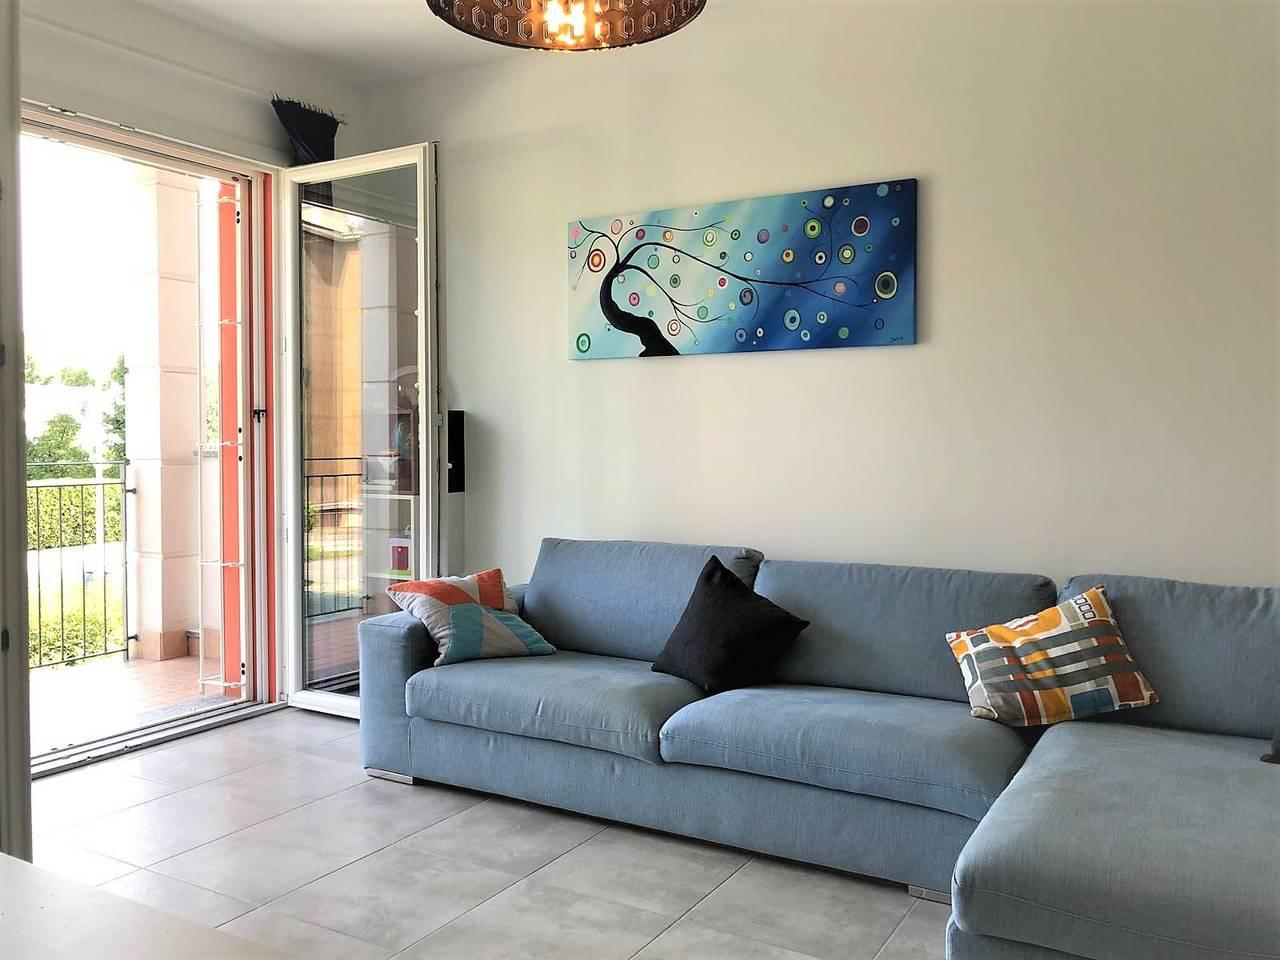 Appartamento-in-vendita-a-Busnago-in-Brianza-1